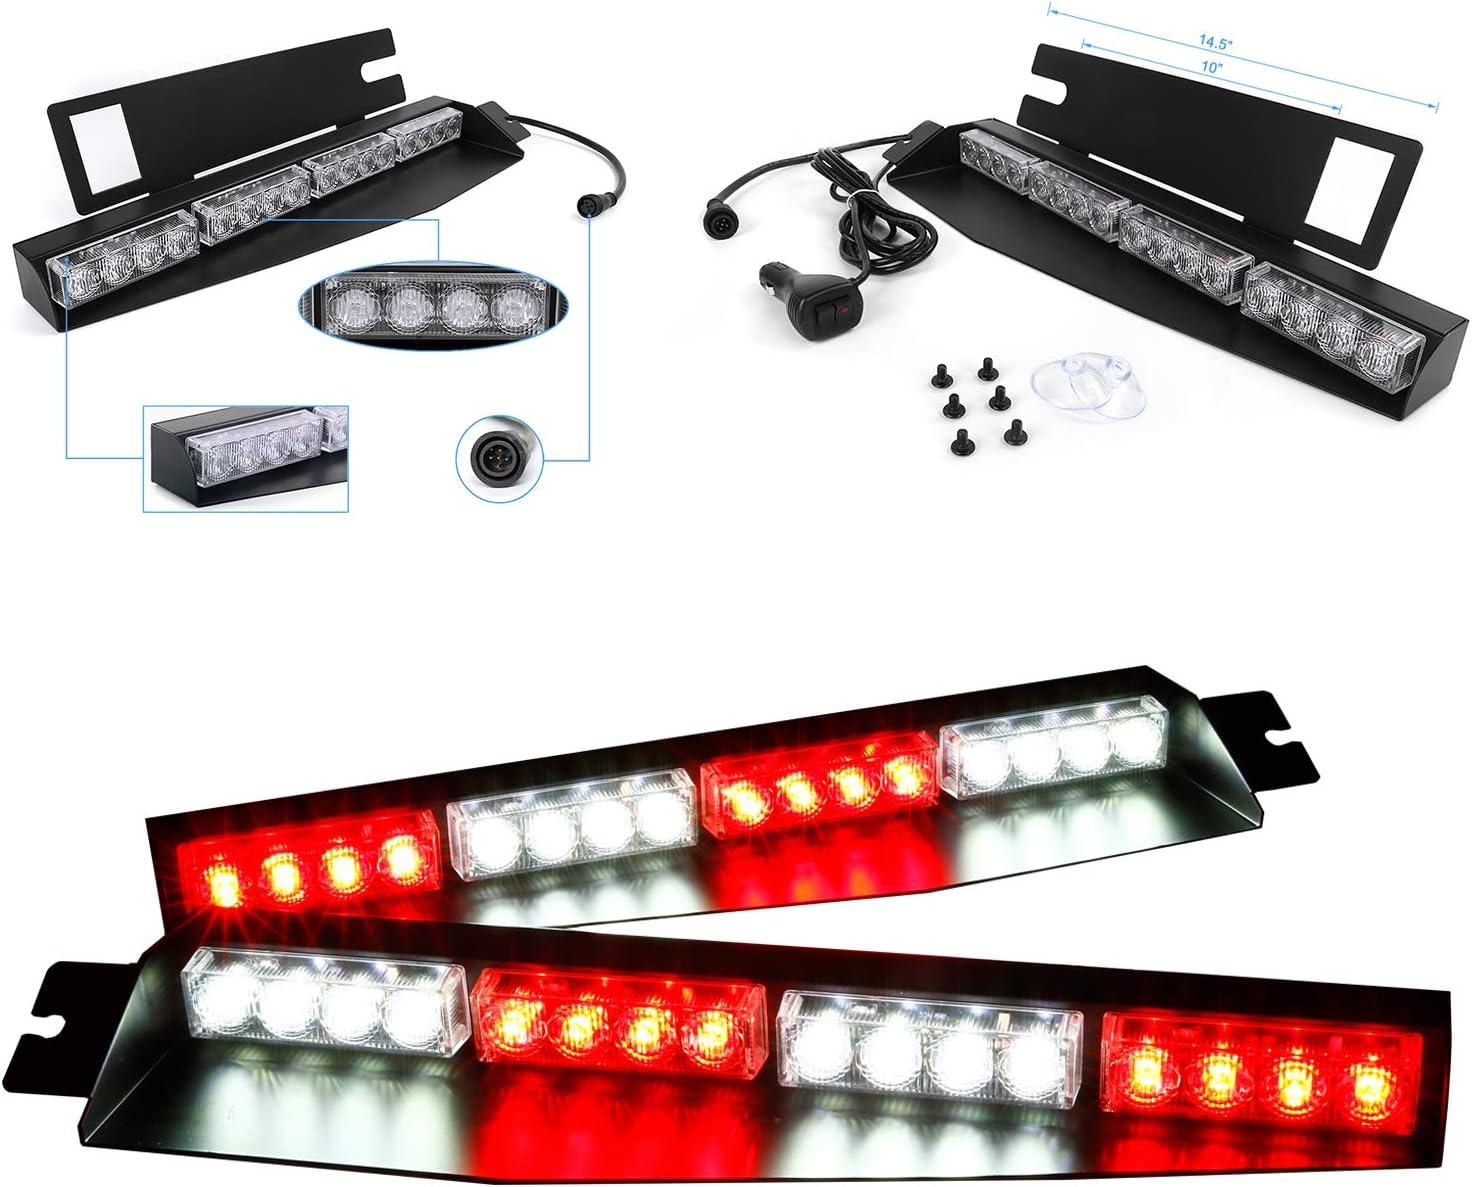 Max 41% OFF 32LED 32W LED Lightbar Kansas City Mall Visor Emergency W Hazard Windshield Light